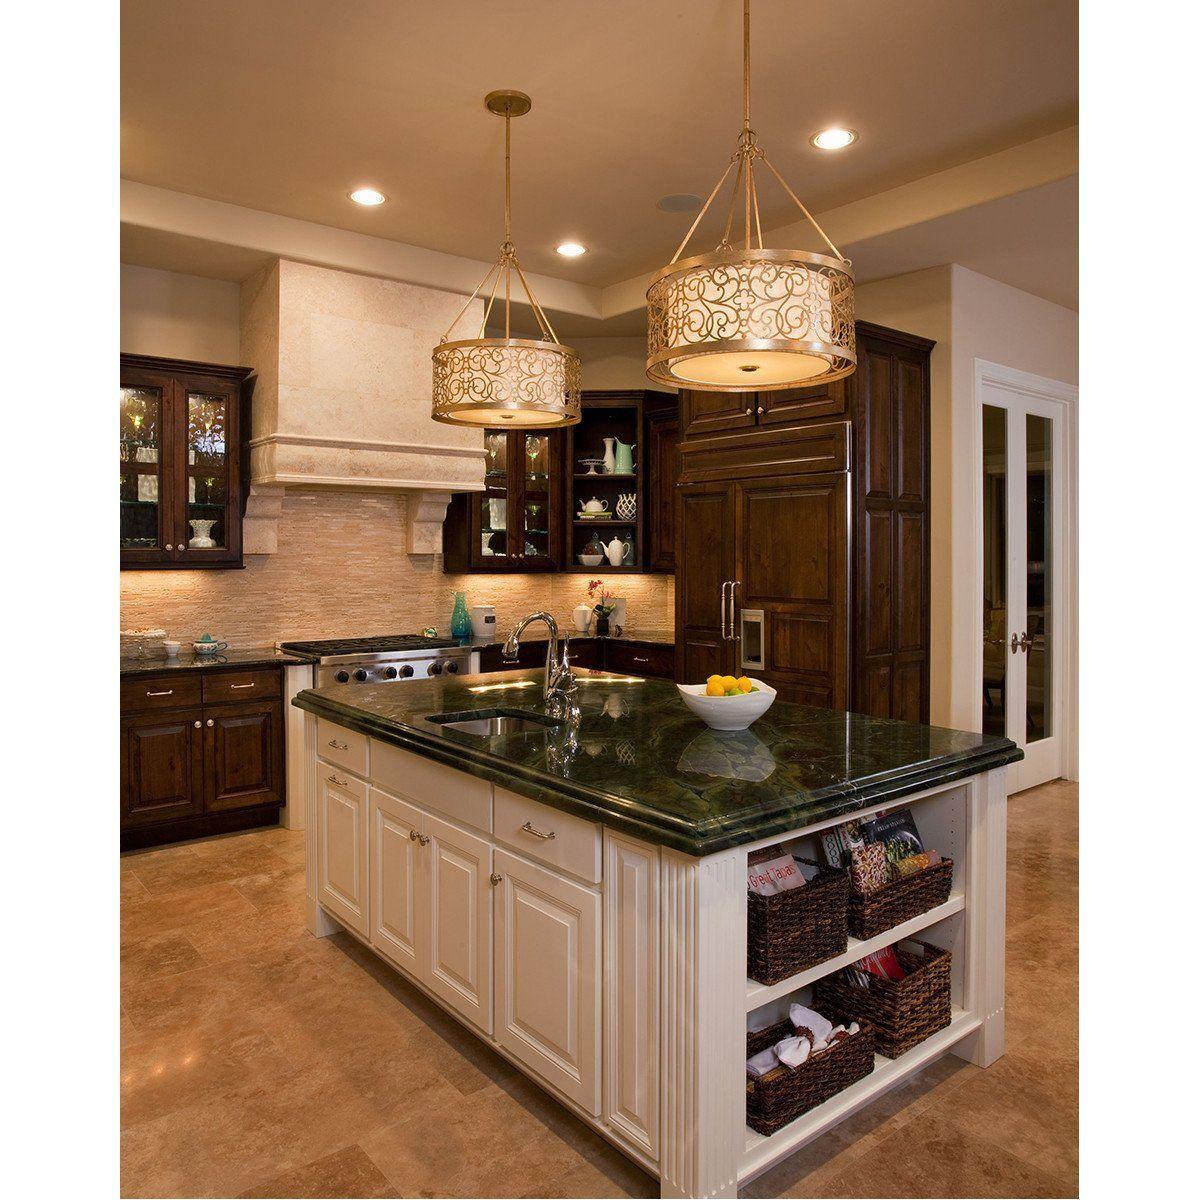 Xo Kitchen: Feiss Arabesque 4 Lights Shade Pendant